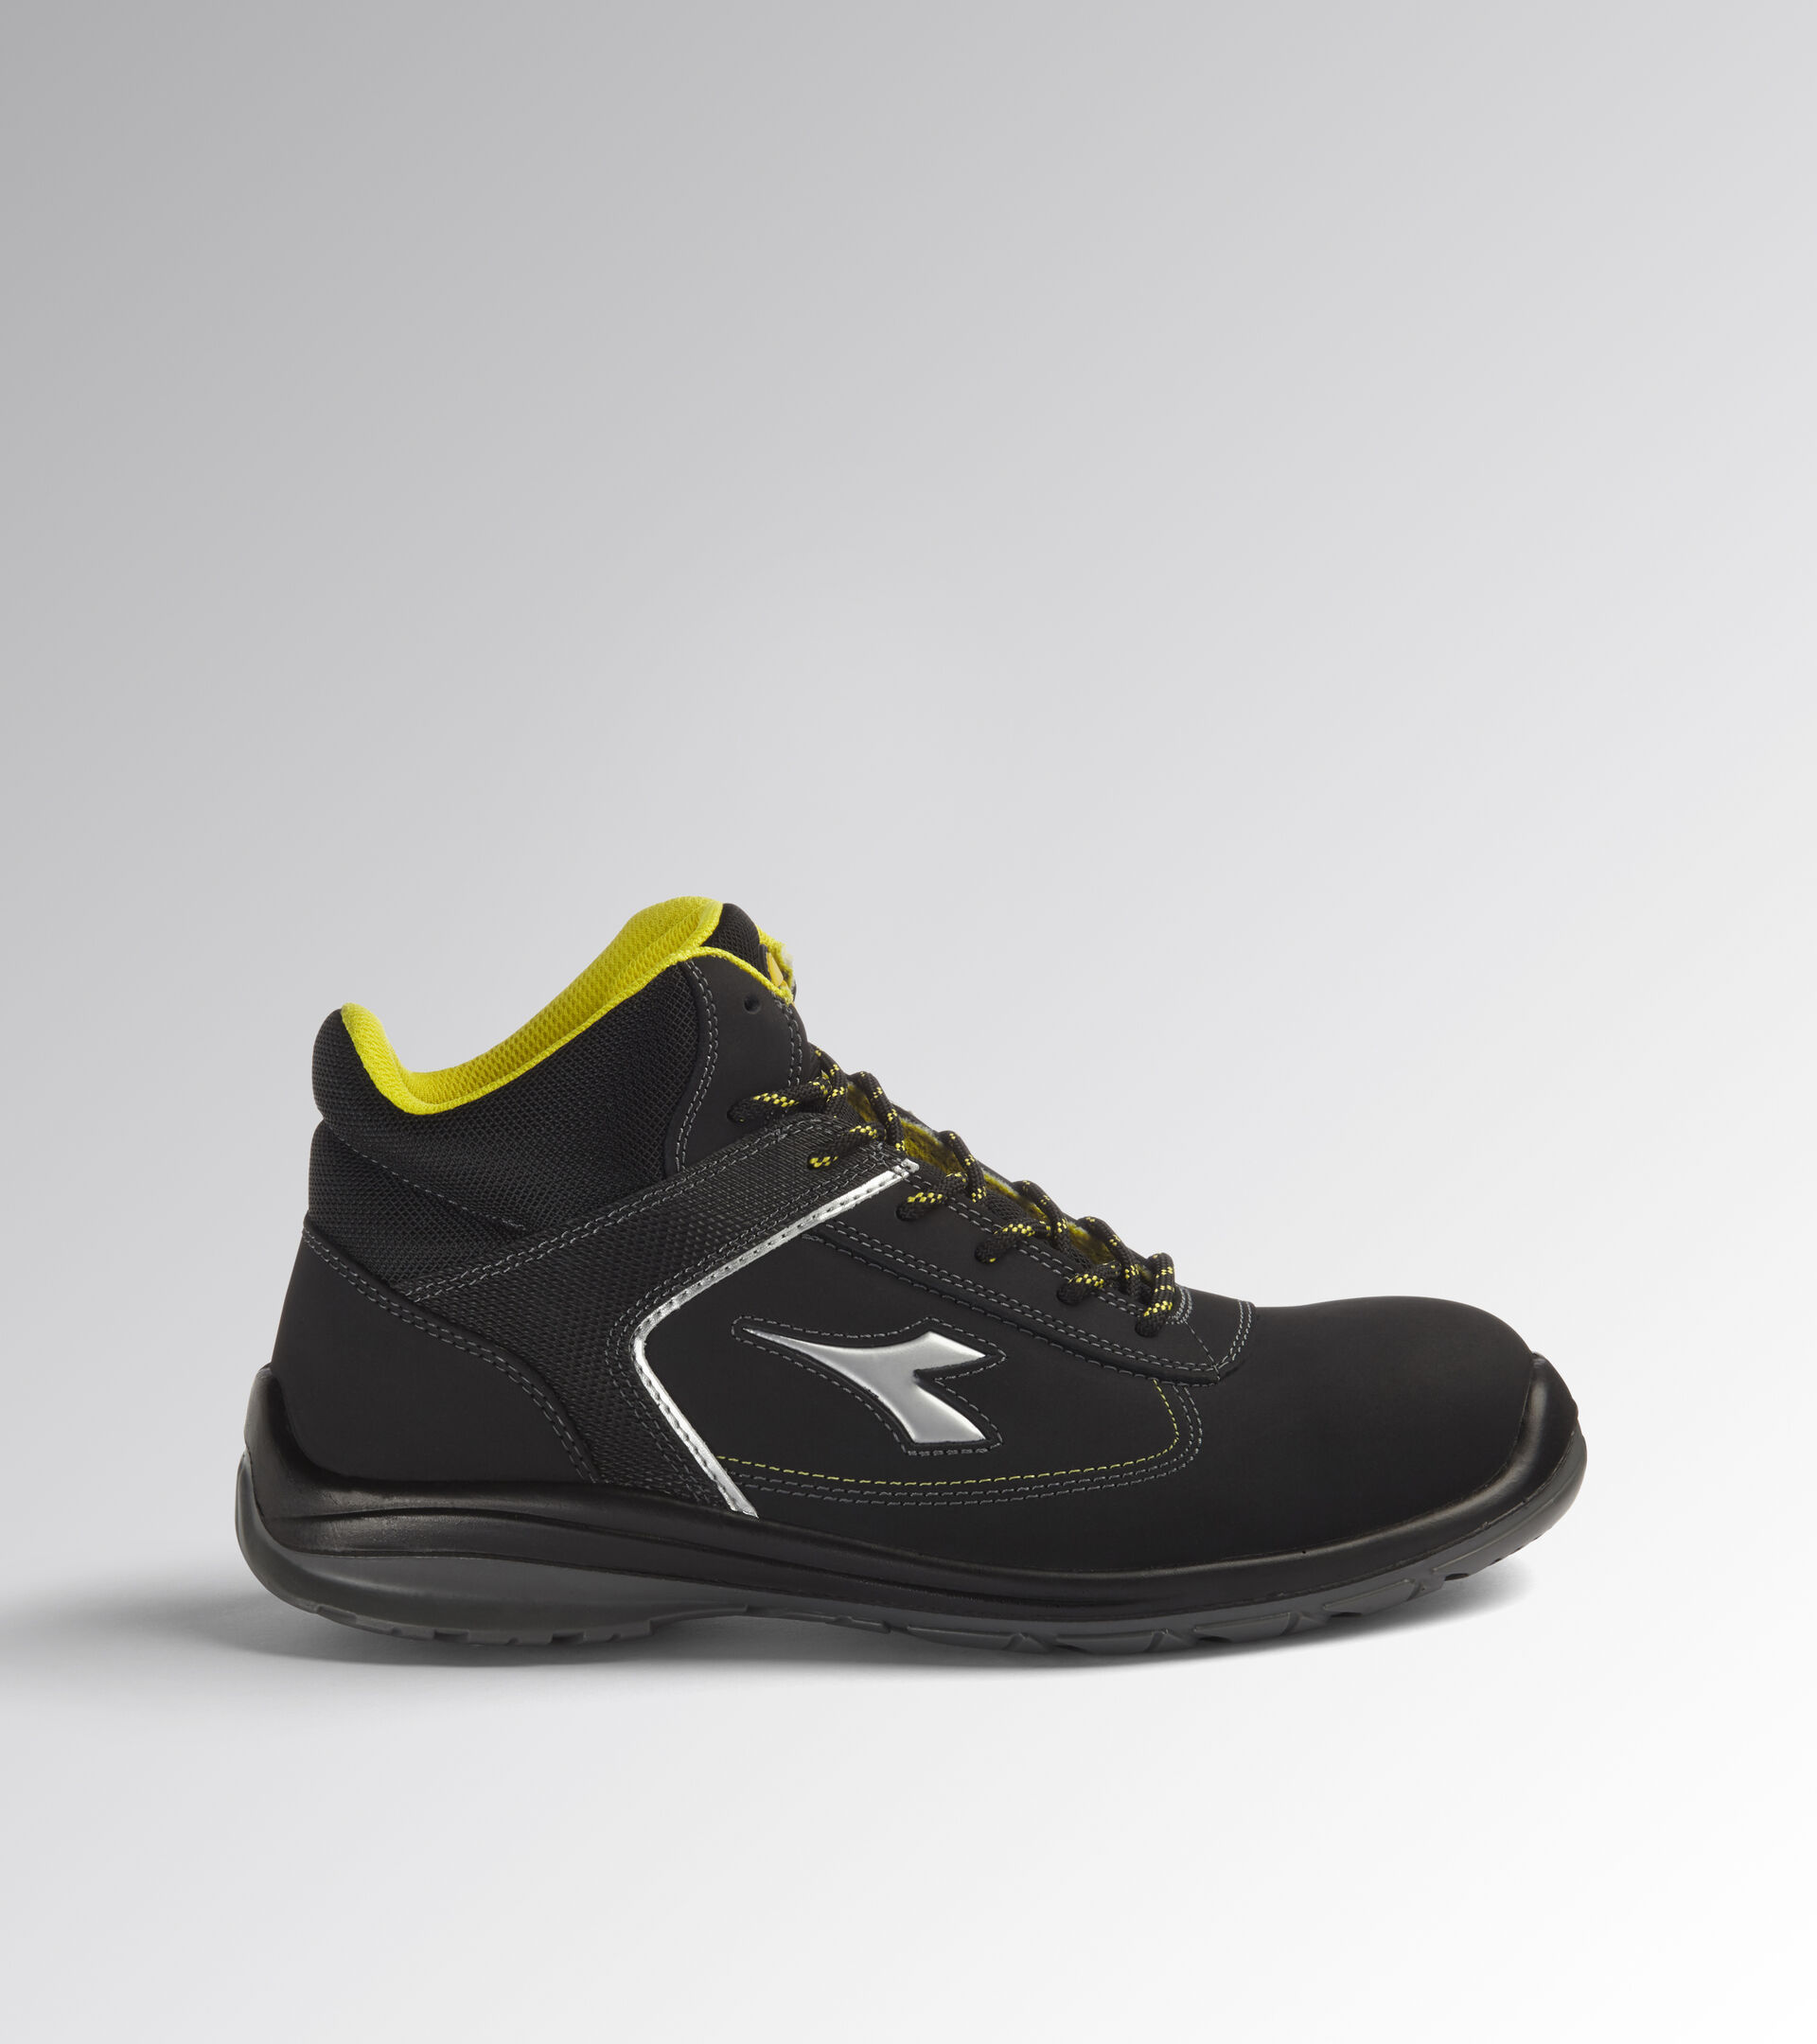 Footwear Utility UNISEX BLITZ MID S3 SRC SCHWARZ Utility